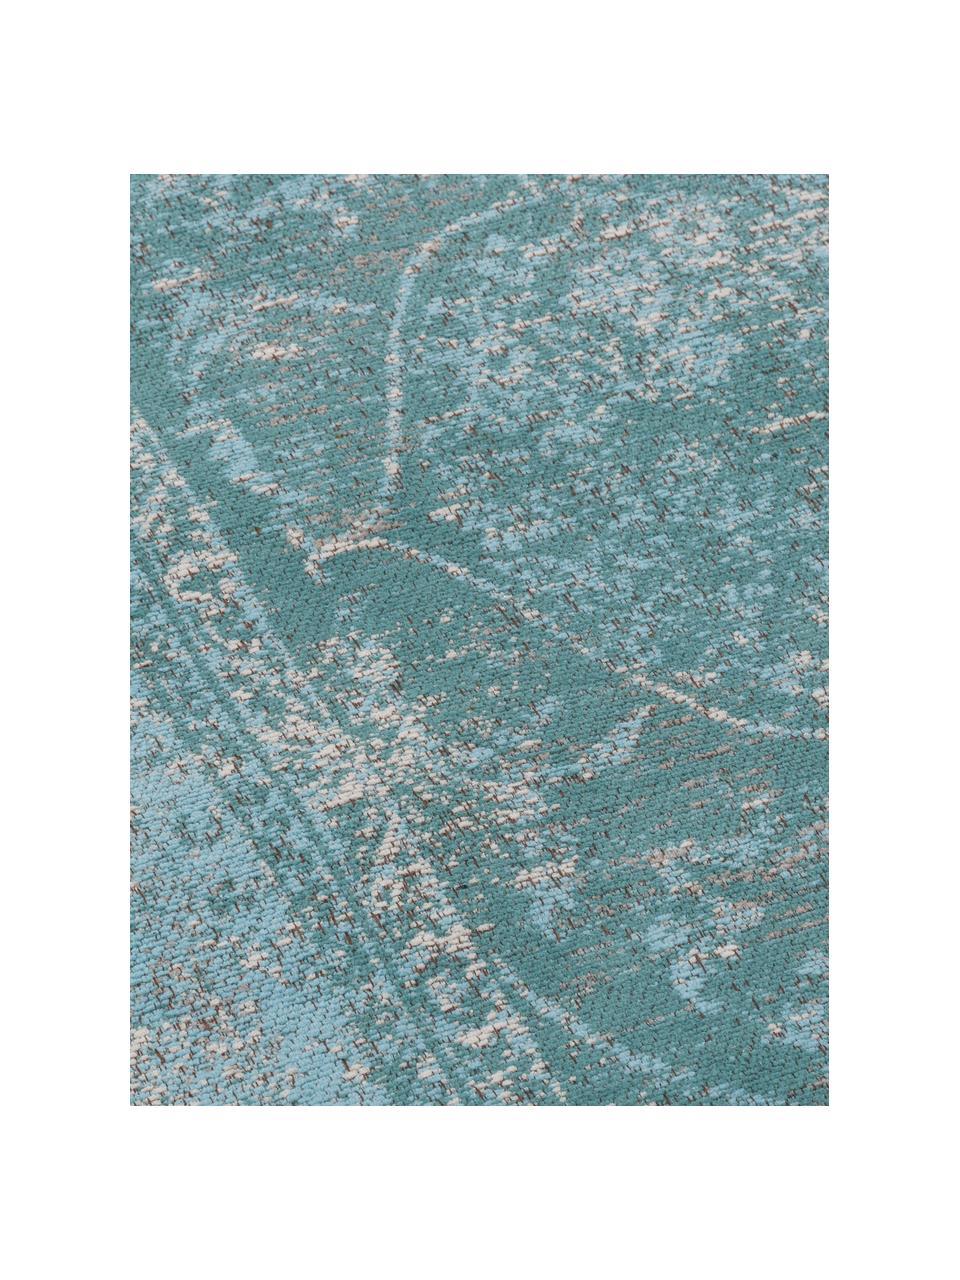 Alfombra artesanal de chenilla Palermo, estilo vintage, Parte superior: 95%algodón, 5%poliéster, Reverso: 100%algodón, Turquesa, azul claro, crema, An 160 x L 230 cm(Tamaño M)